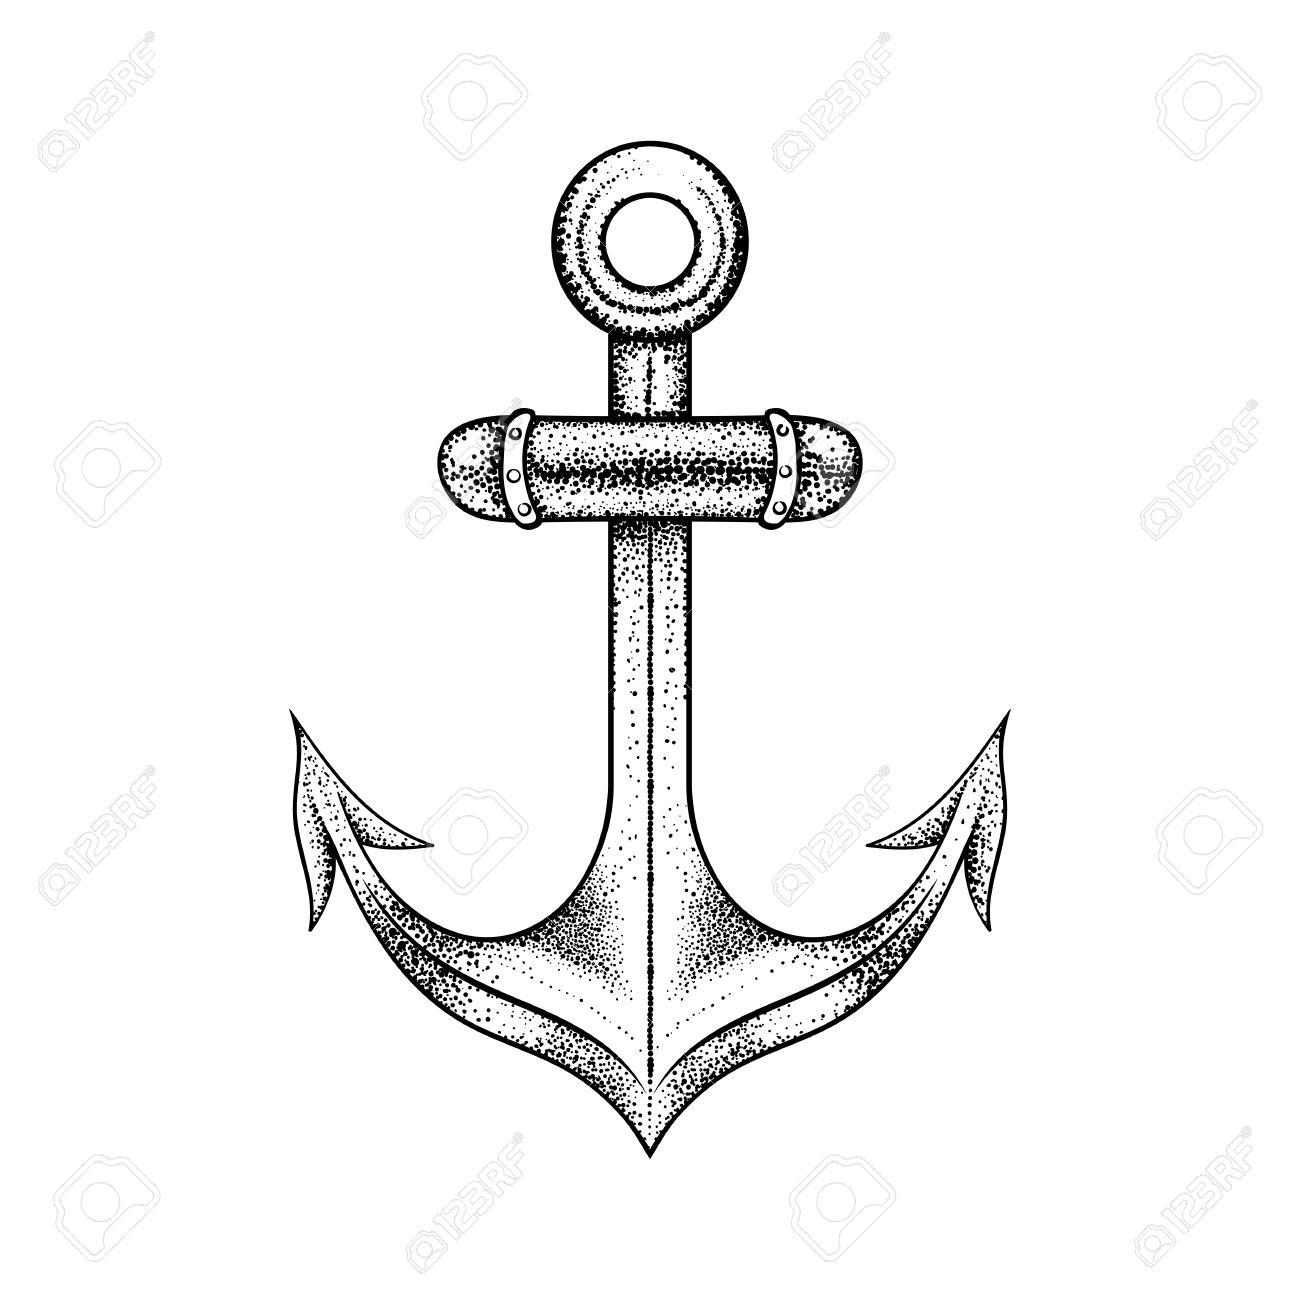 1300x1300 Hand Drawn Elegant Ship Sea Anchor, Black Sketch For Tattoos